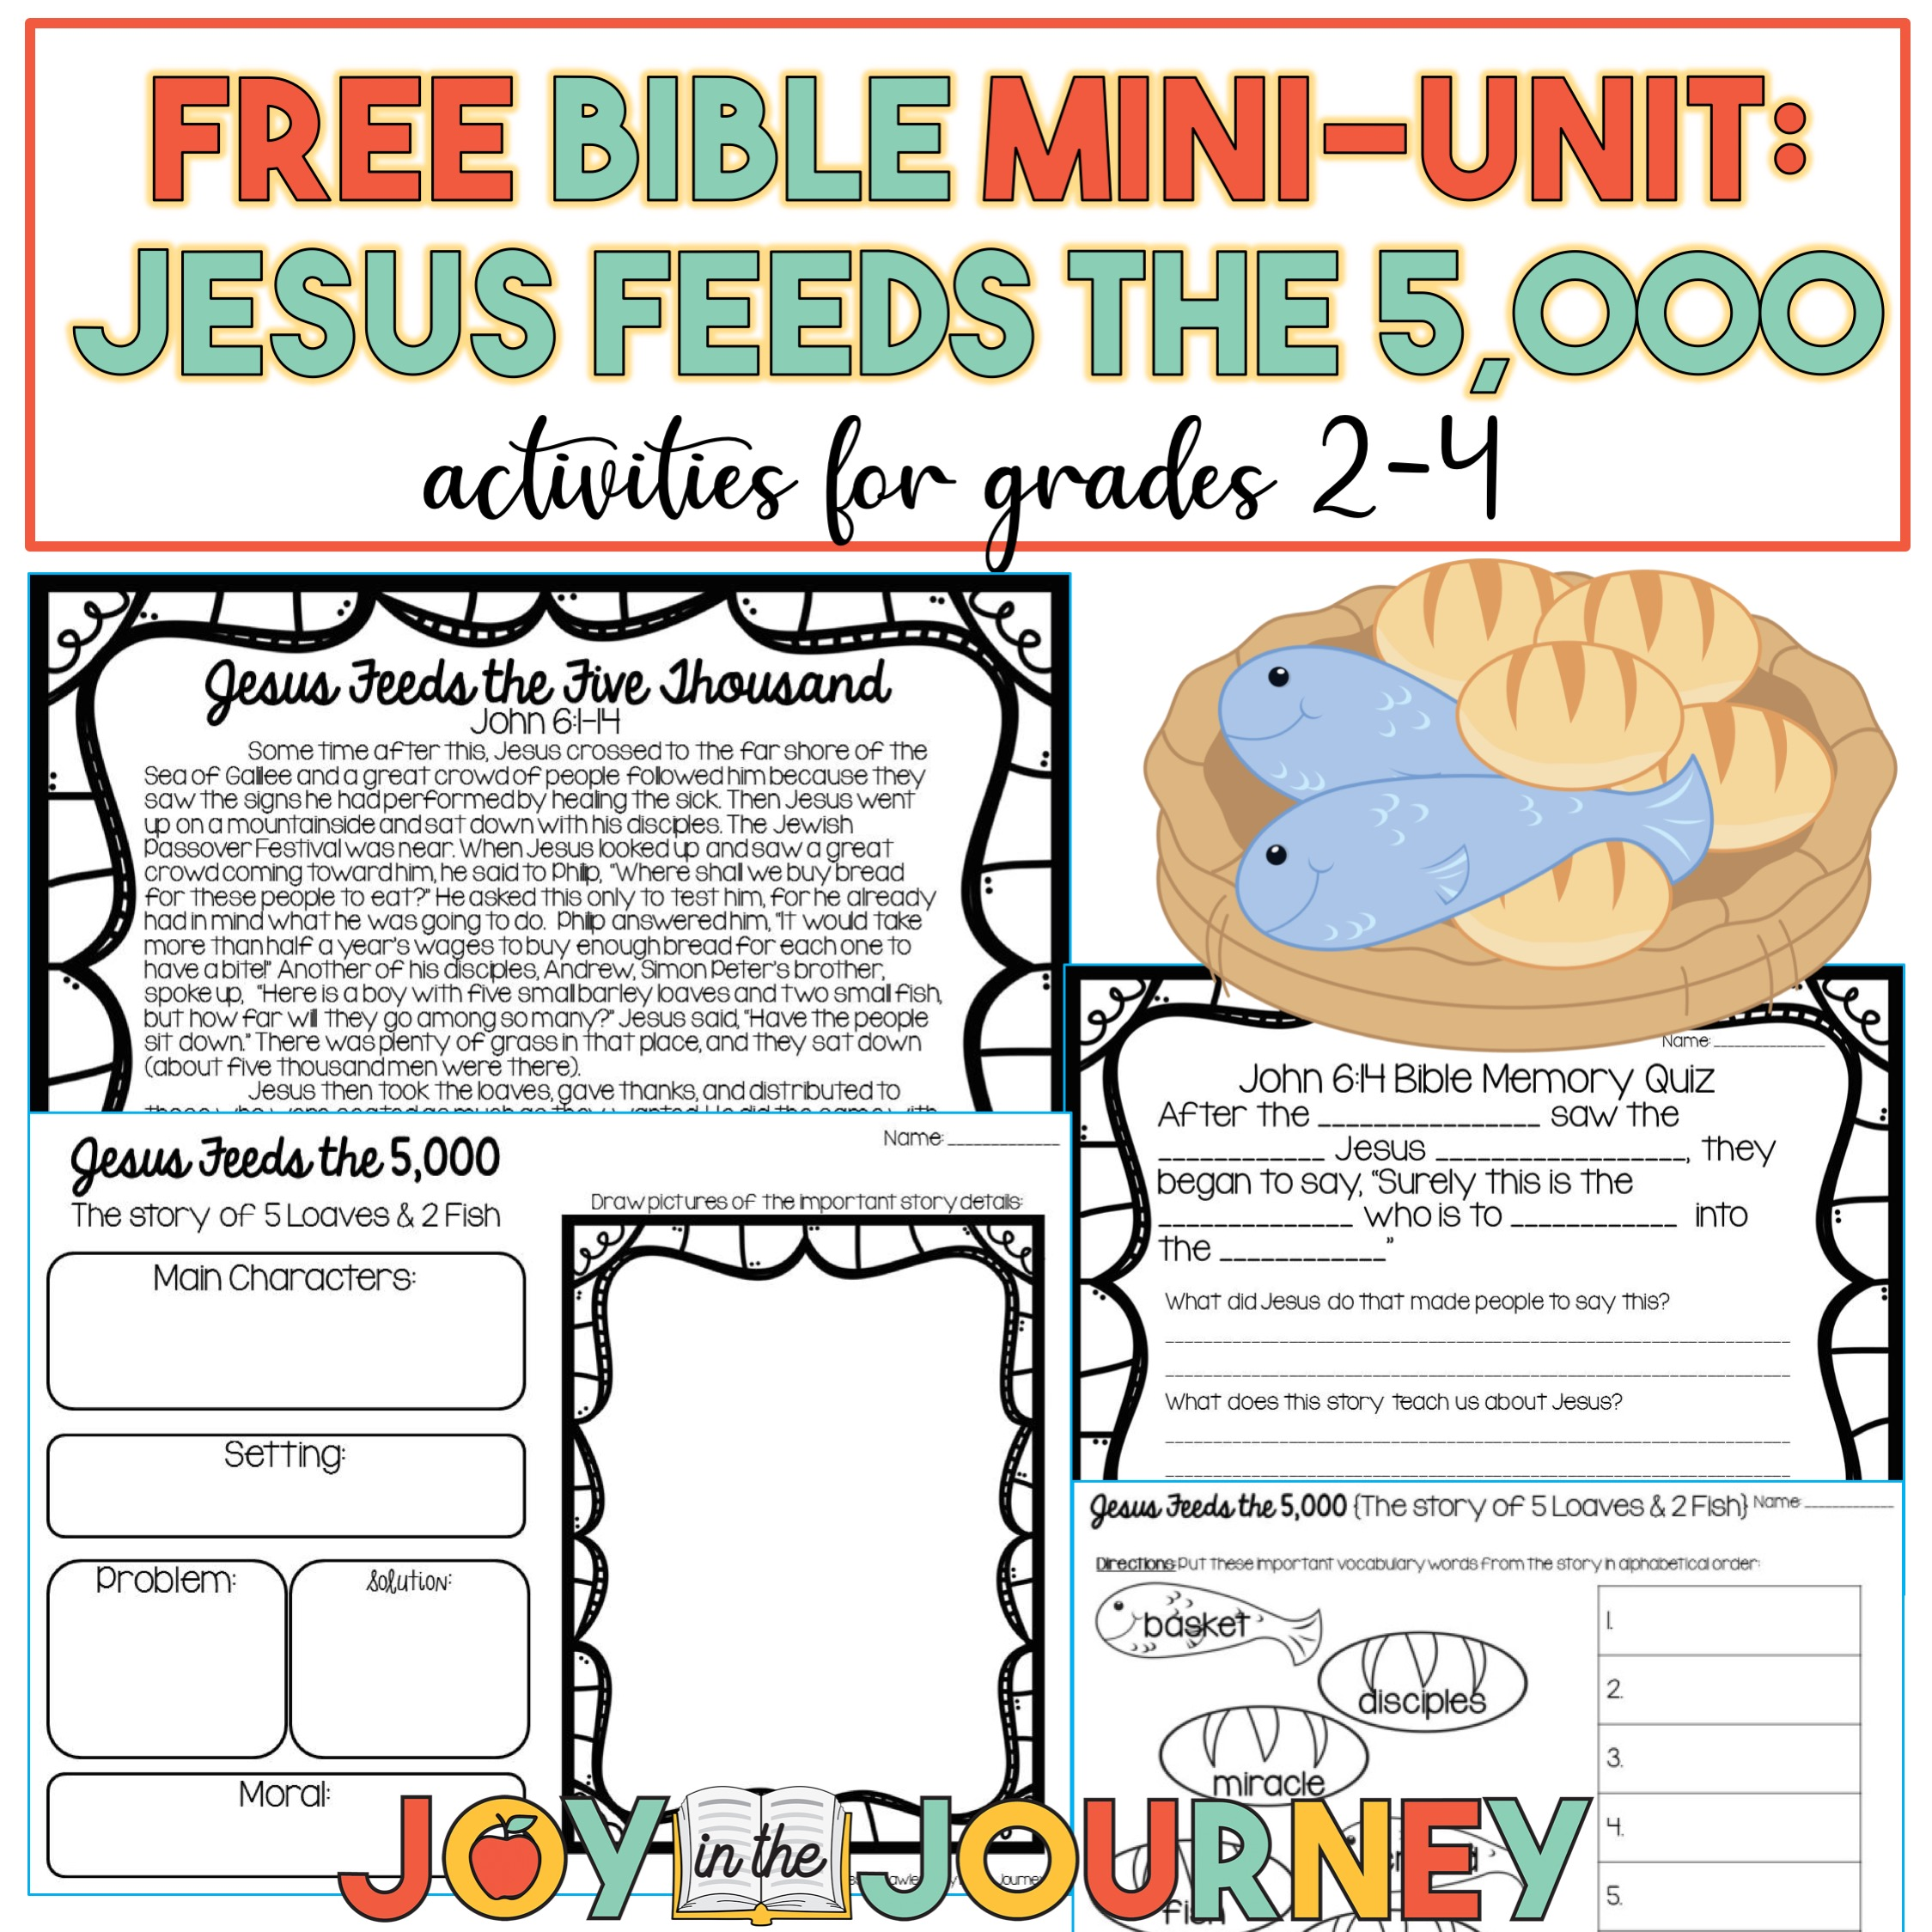 FREE Jesus Feeds the 5,000